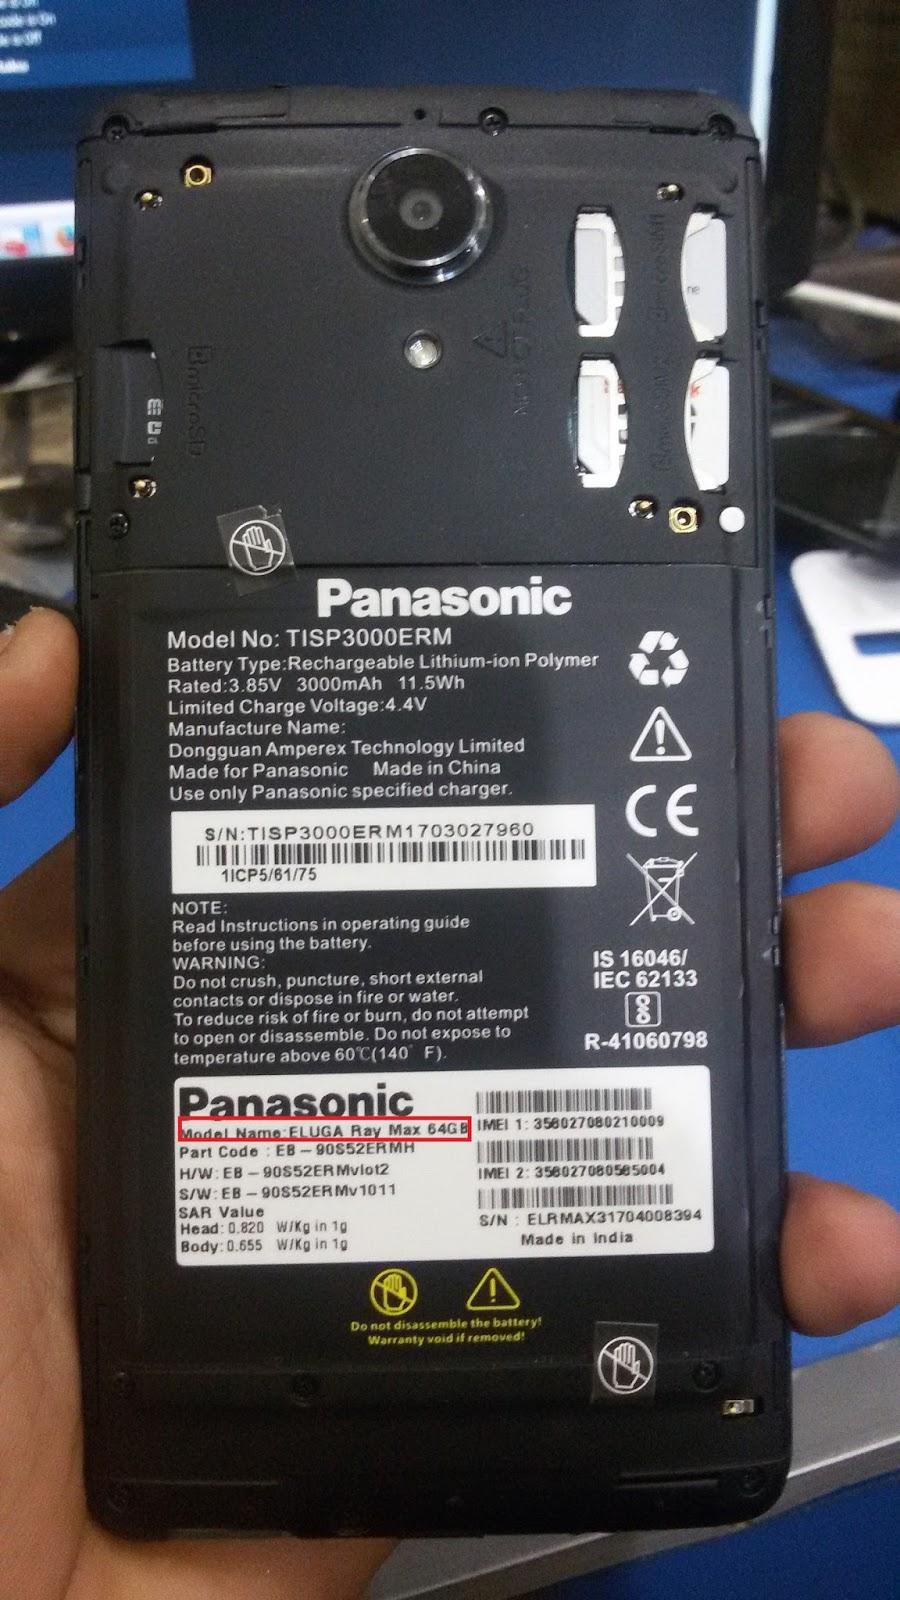 ELUGA RAY MAX 64GB FIRMWARE QUALCOMM 100% TESTED - Sharif